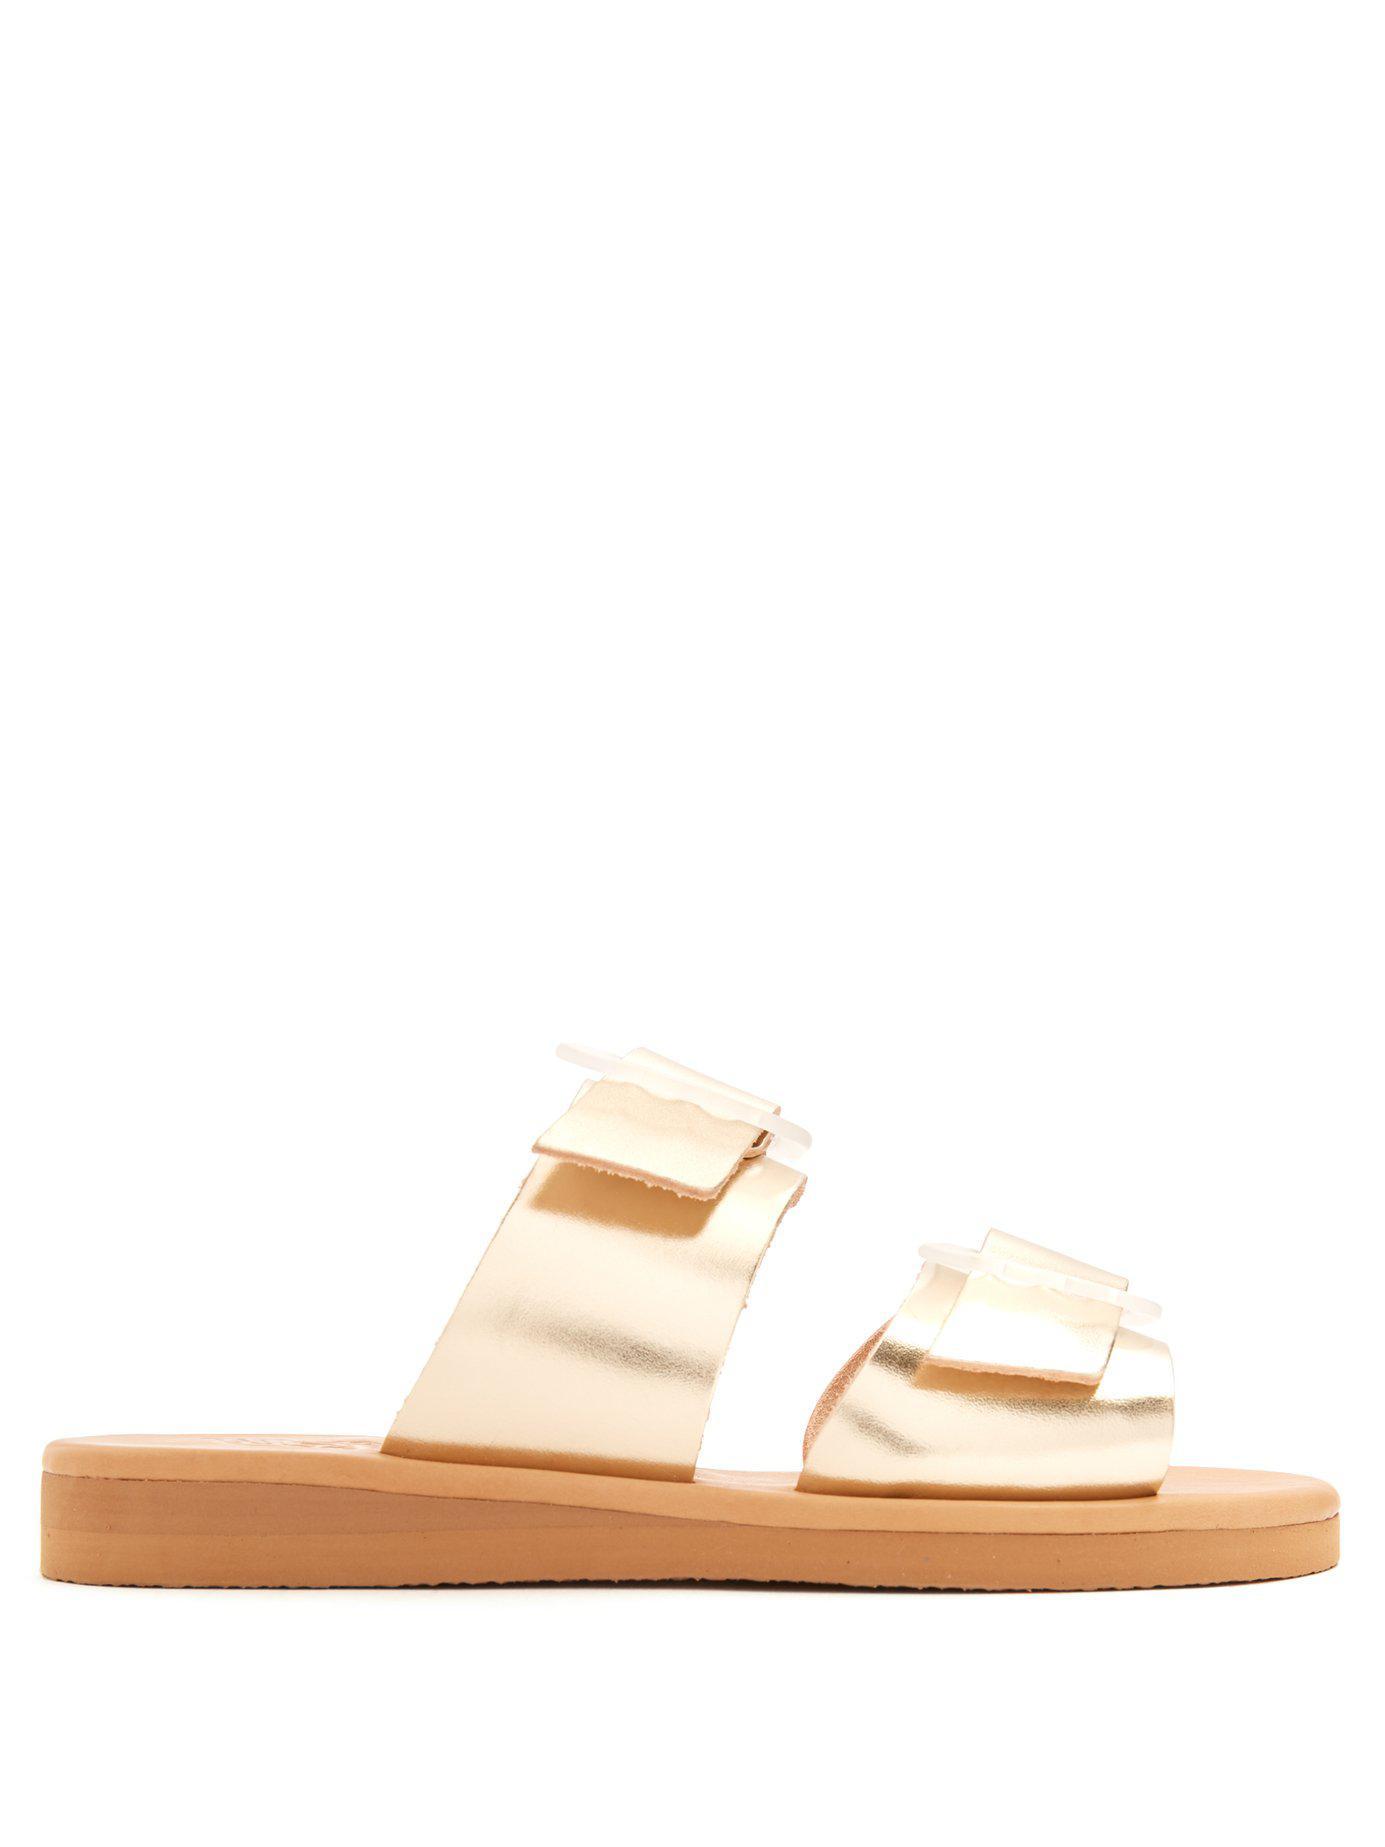 Sandales en cuir verni IasoAncient Greek Sandals j0ovvege